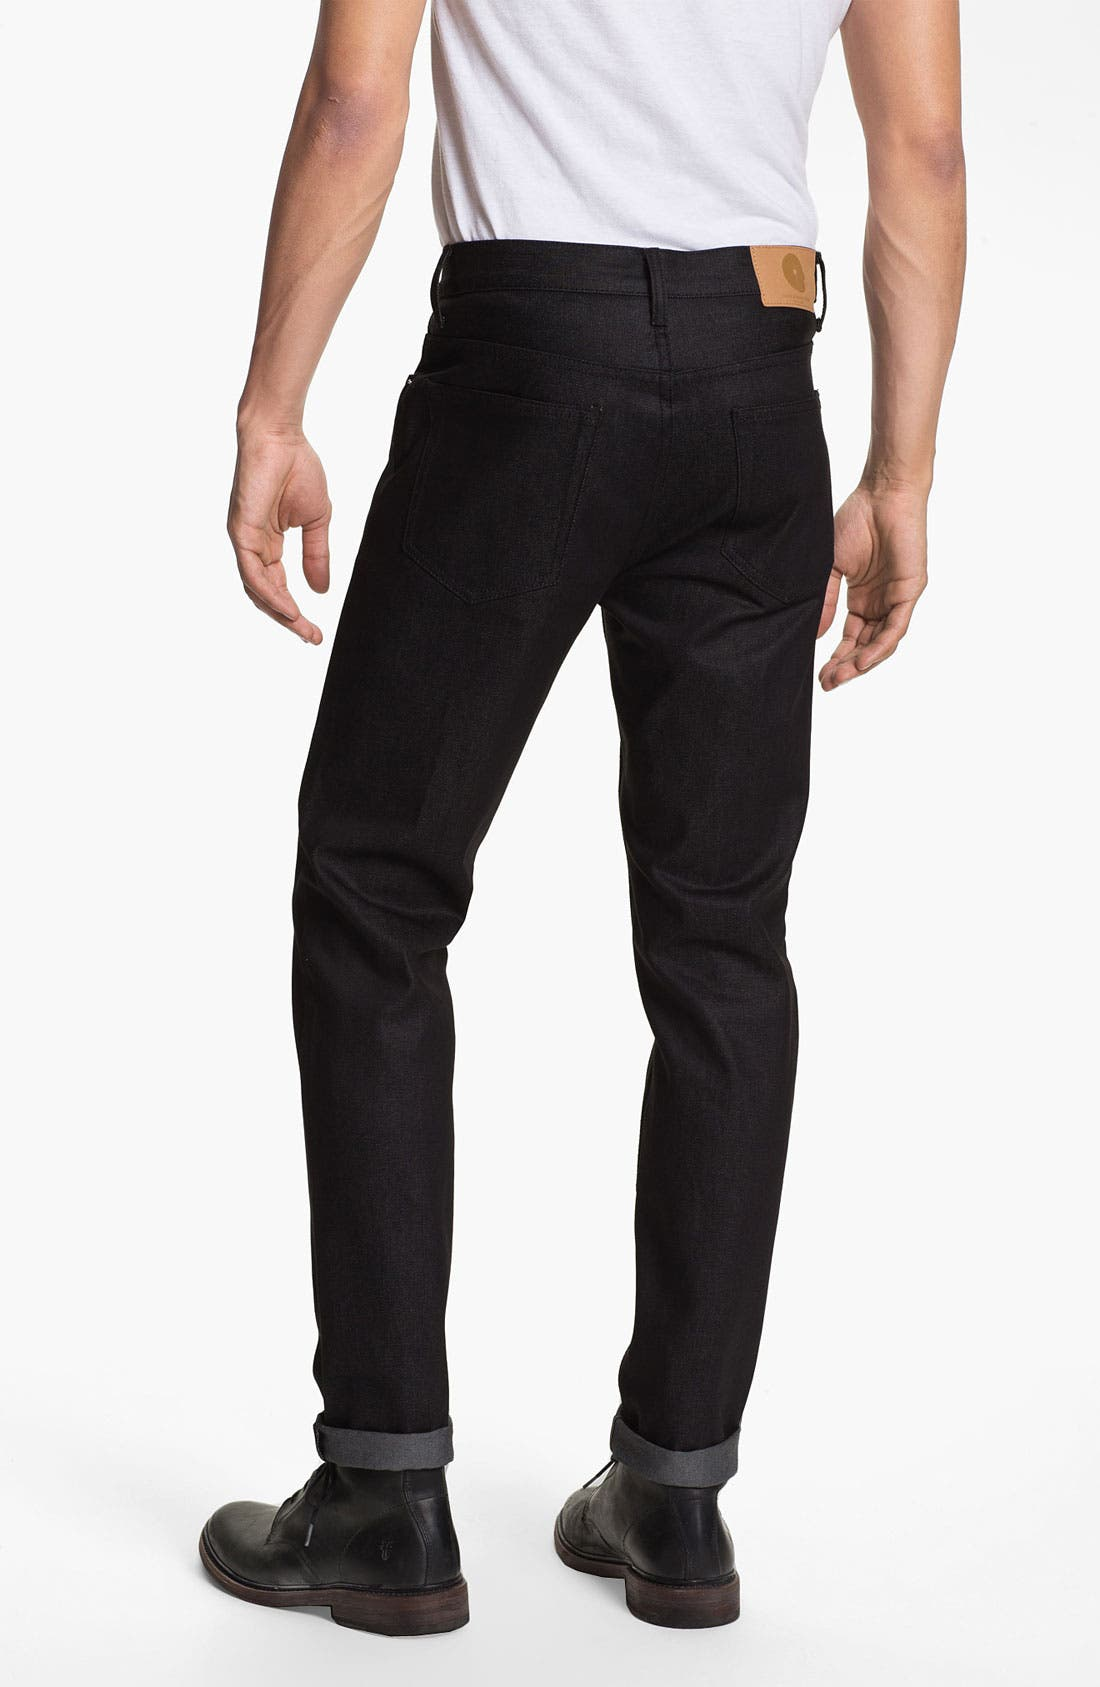 Alternate Image 1 Selected - Cheap Monday High Slim Leg Jeans (Dry Black)